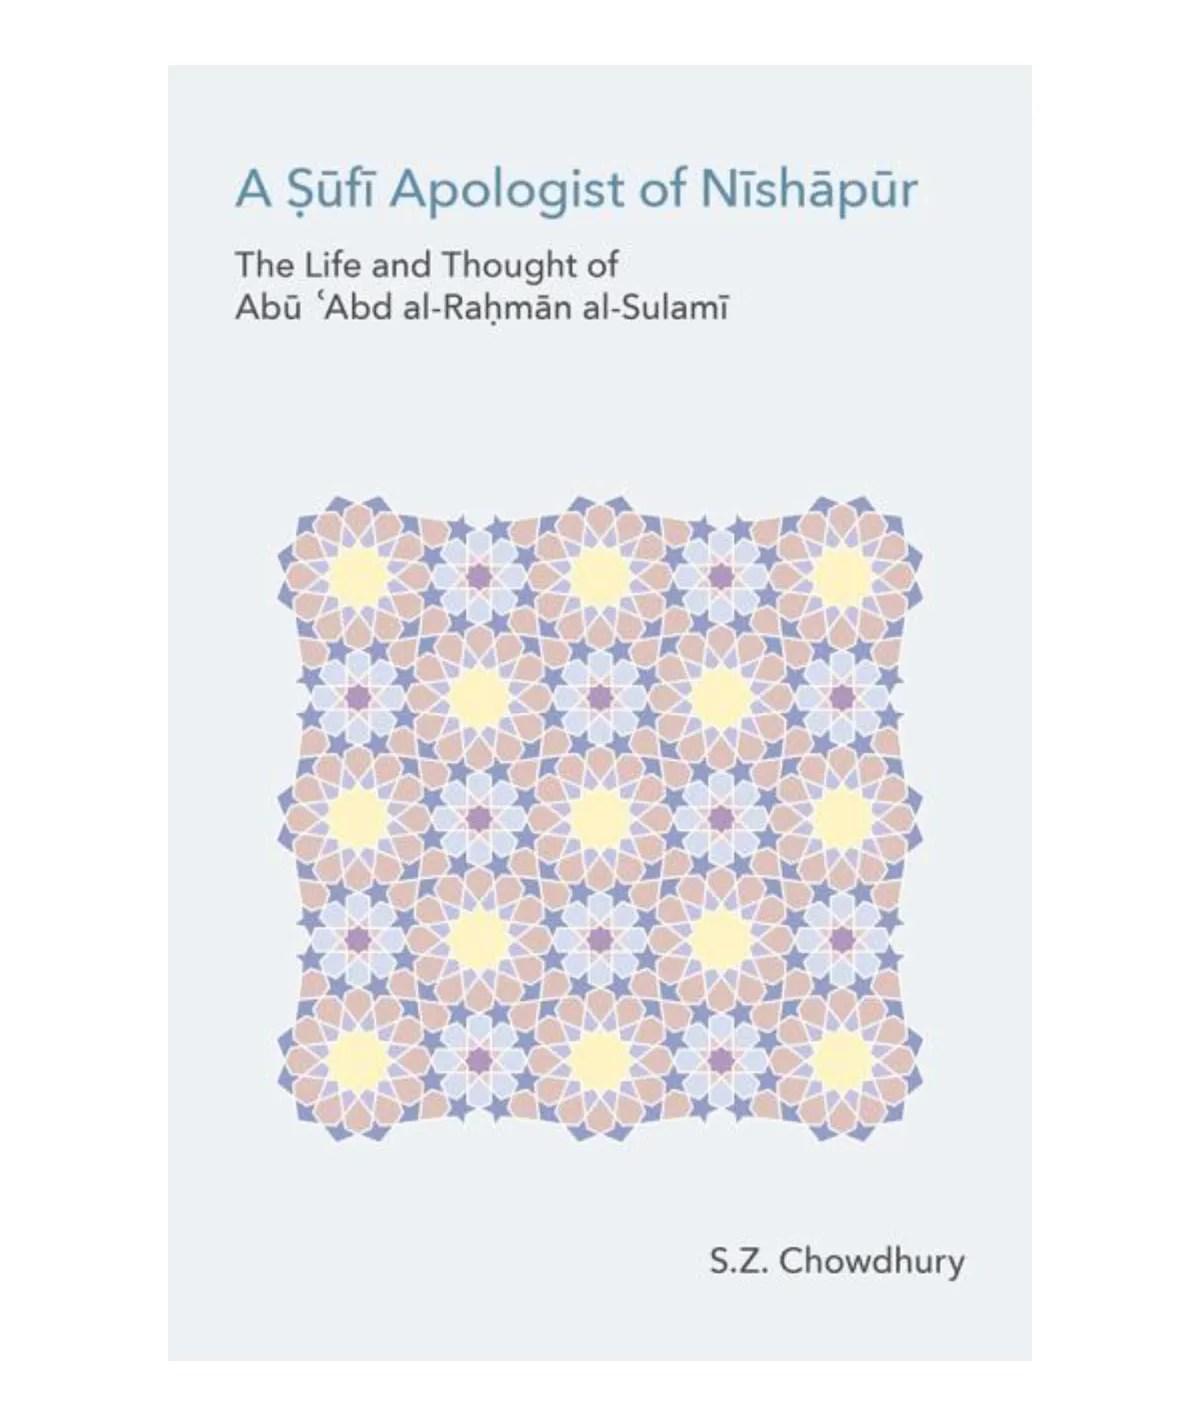 A Sufi Apologist of Nishapur: The Life and Thought of Abu Cabd Al-Rahman Al-Sulami  ( Monographs in Arabic and Islamic Studies  #F  ): Chowdhury, Sz